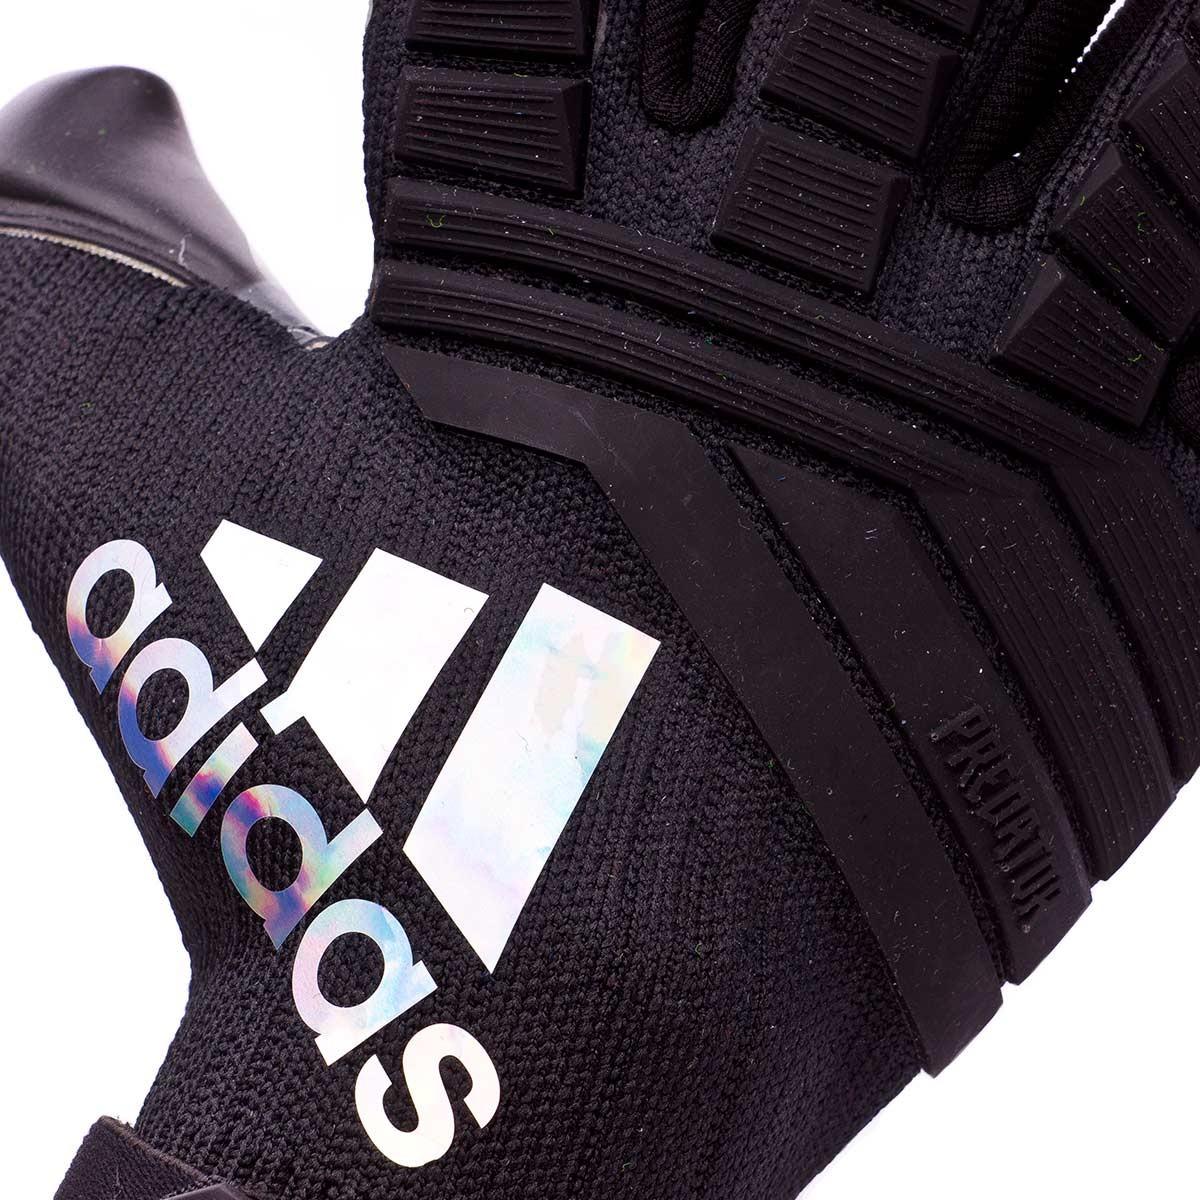 unique design best shoes performance sportswear Gant adidas Predator Pro